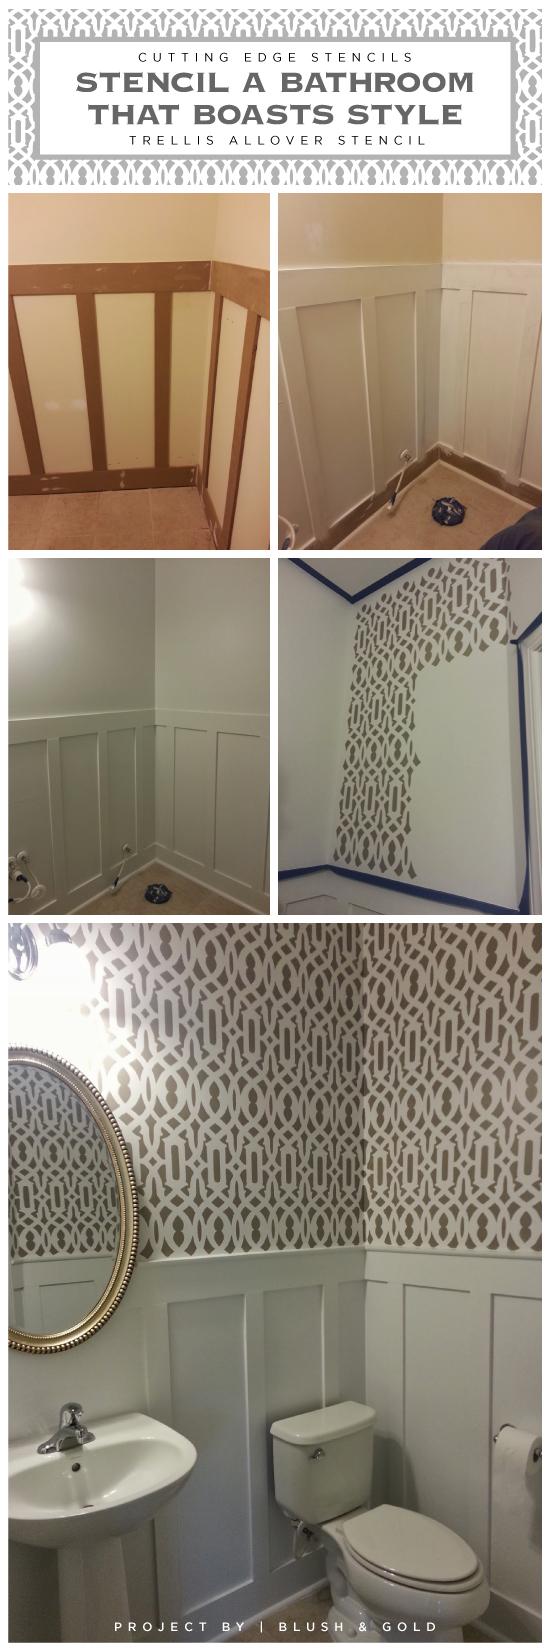 A DIY stenciled bathroom featuring the Trellis Allover pattern for a wallpaper look. http://www.cuttingedgestencils.com/allover-stencil.html